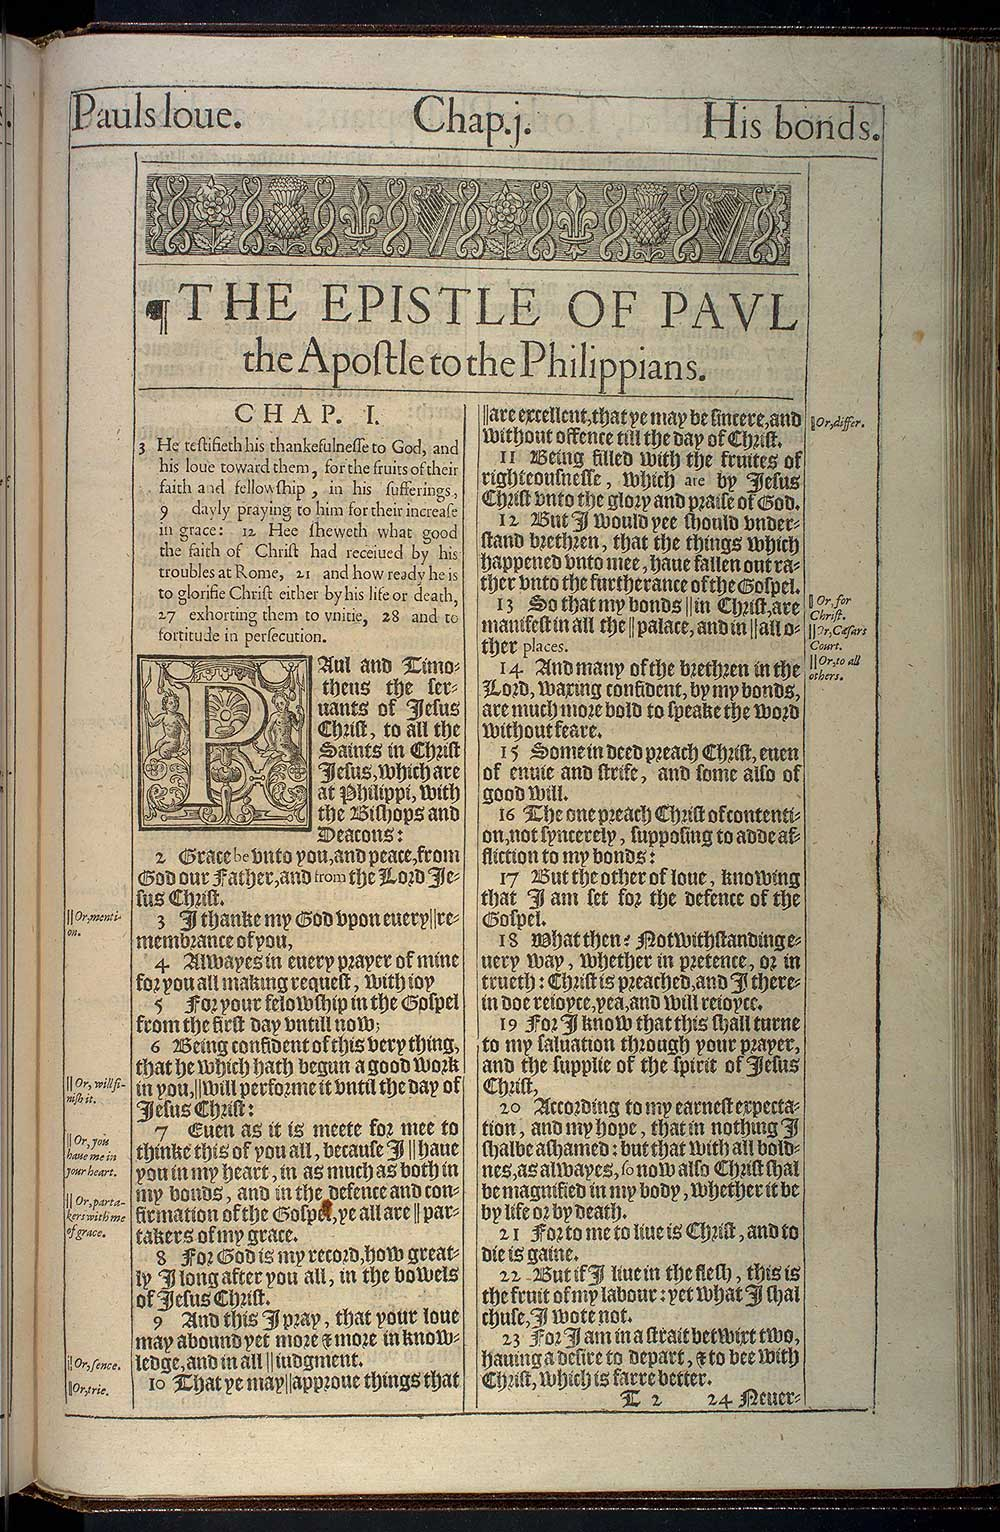 Philippians Chapter 1 Original 1611 Bible Scan